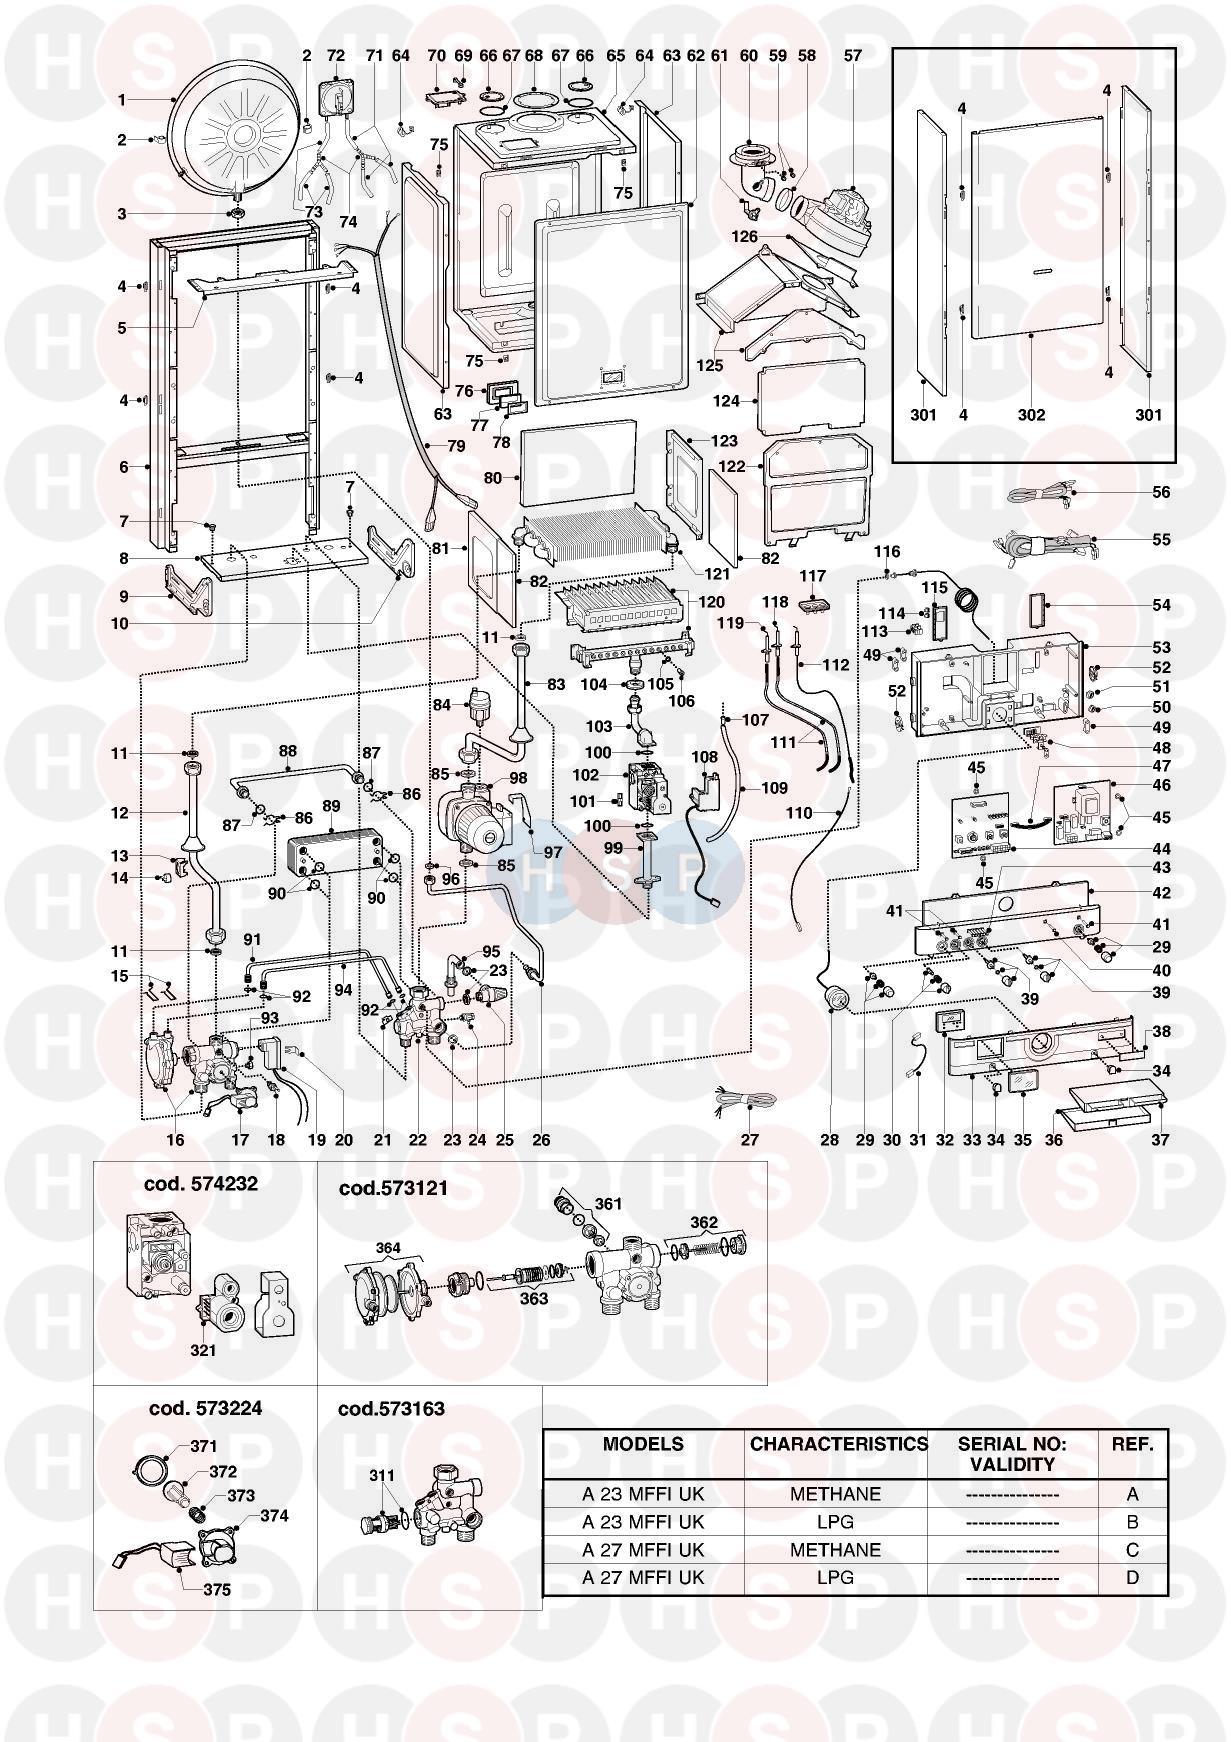 ARISTON EUROCOMBI A23MFFI A27MFFI BOILER RIGHT HAND IGNITION ELECTRODE 569560